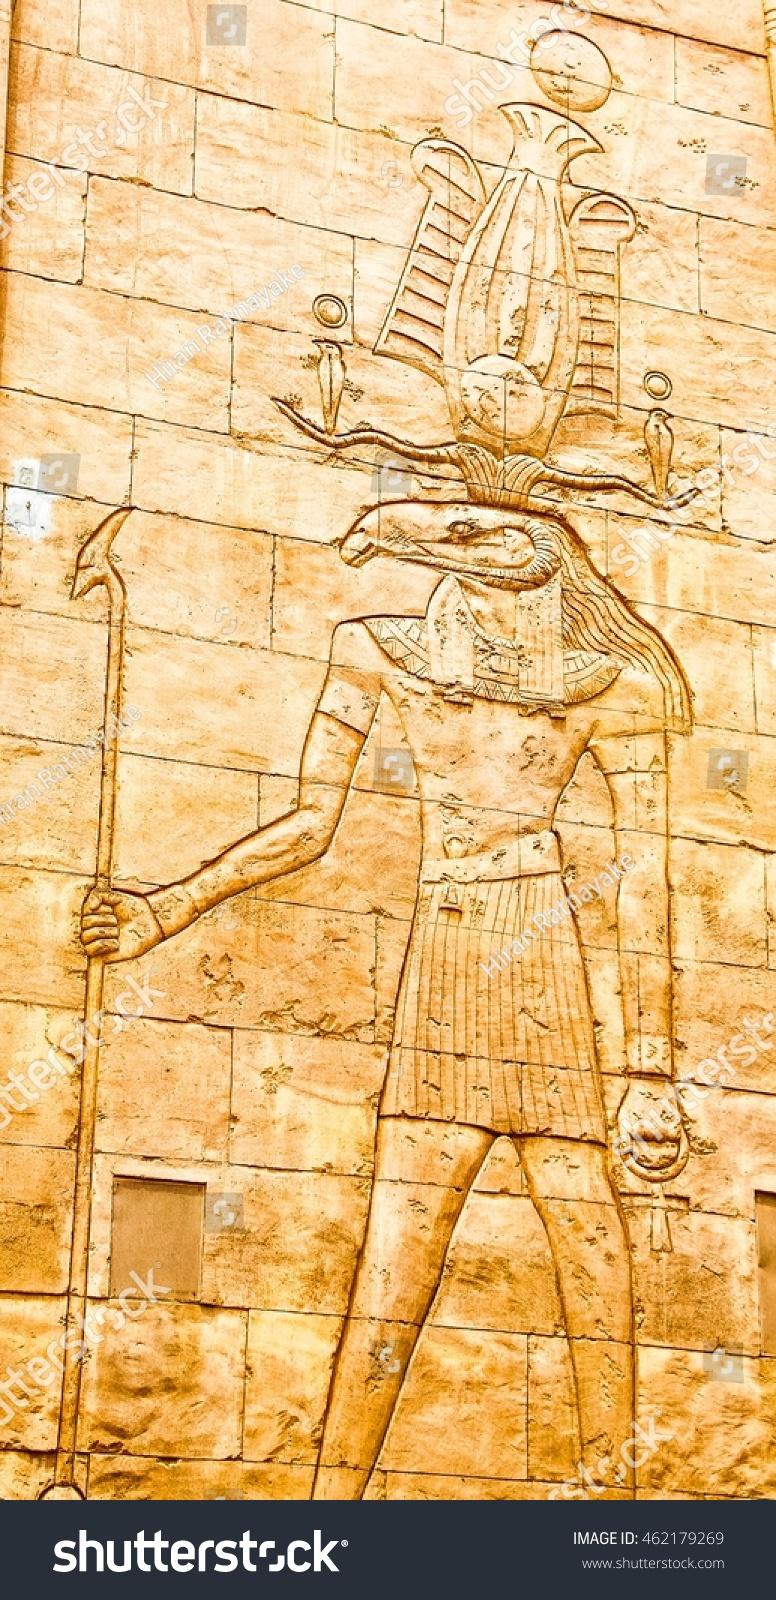 Modern Egyptian Wall Art Adornment - The Wall Art Decorations ...